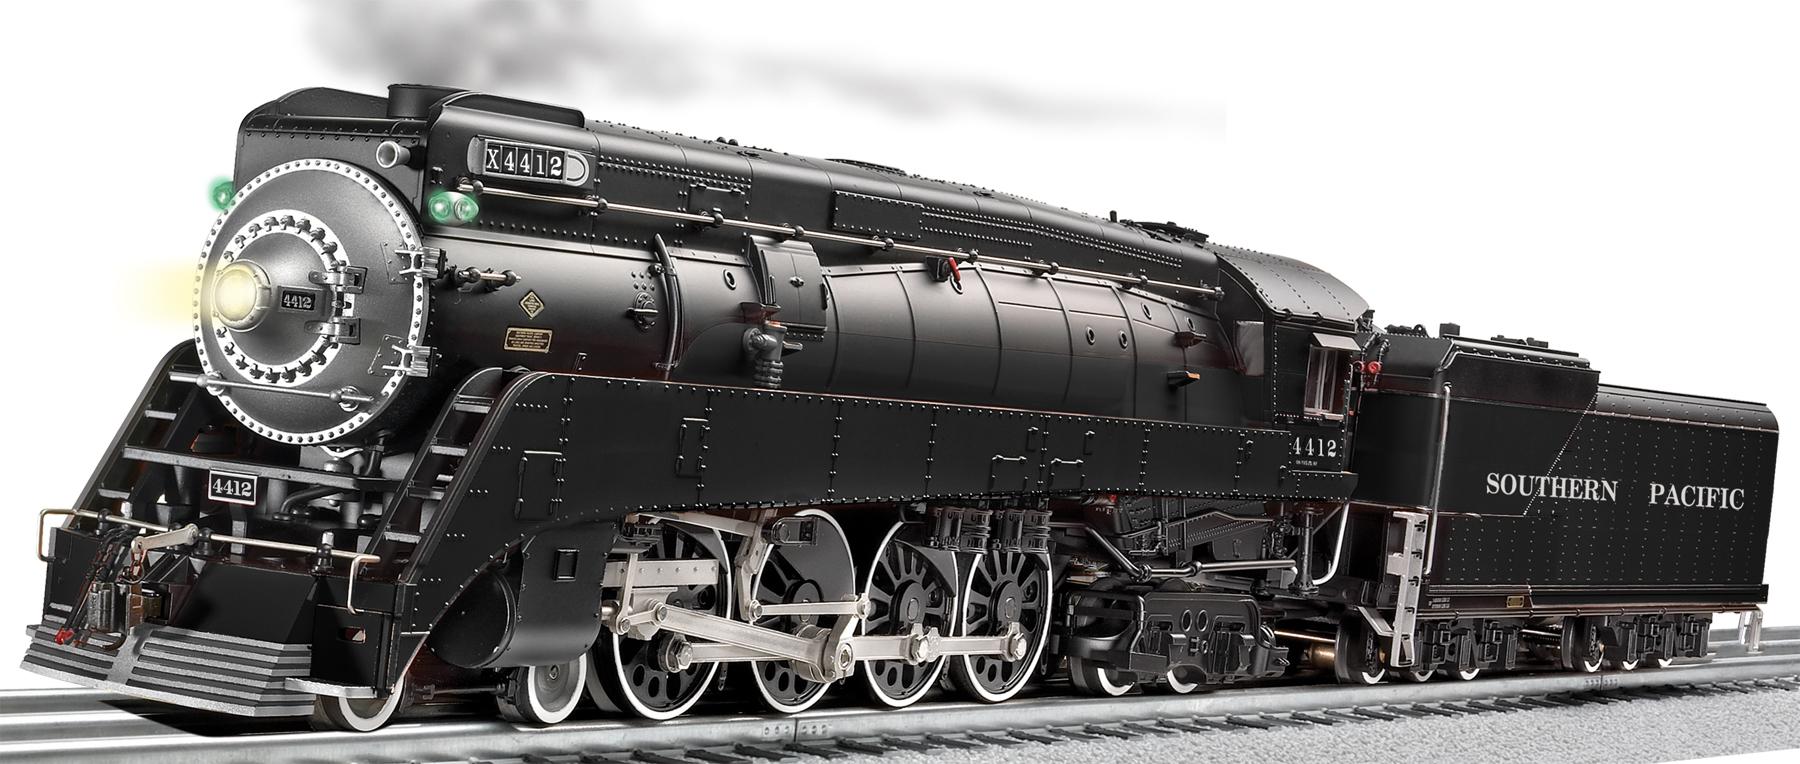 Lionel train values